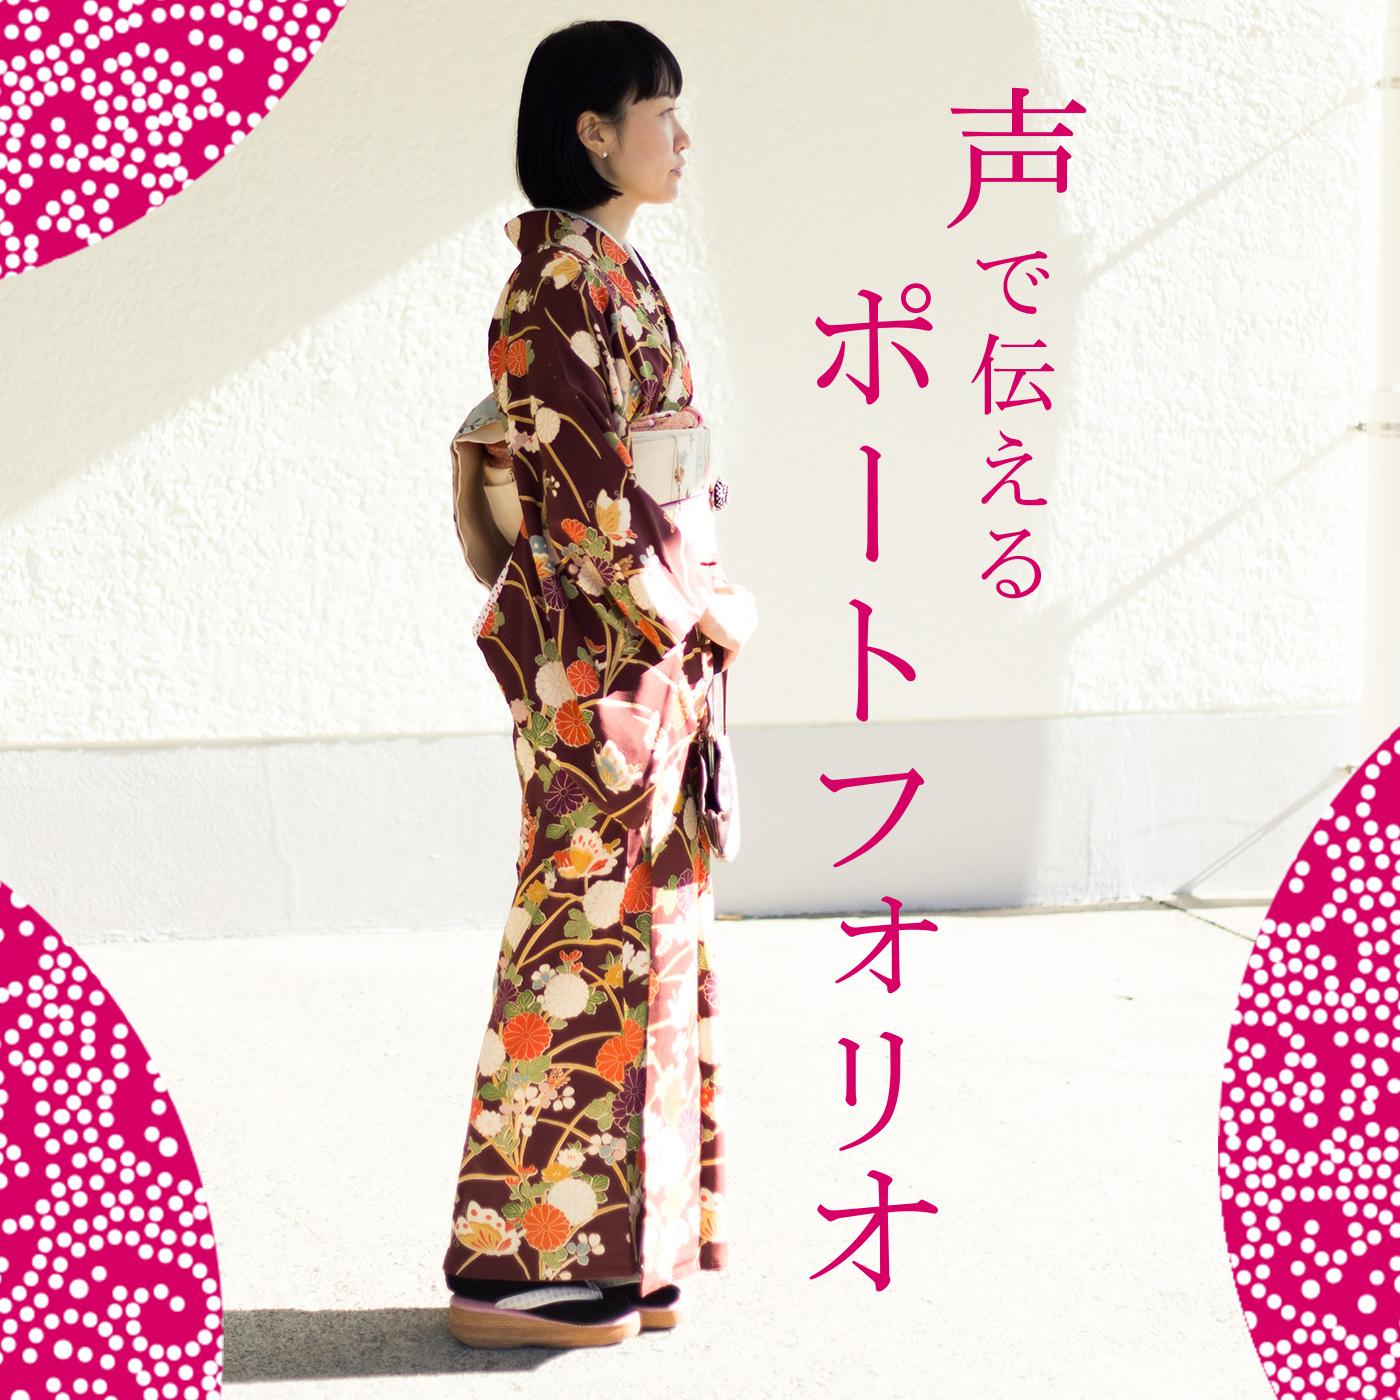 cocon 富川蕗子 『 声で伝えるポートフォリオ 』